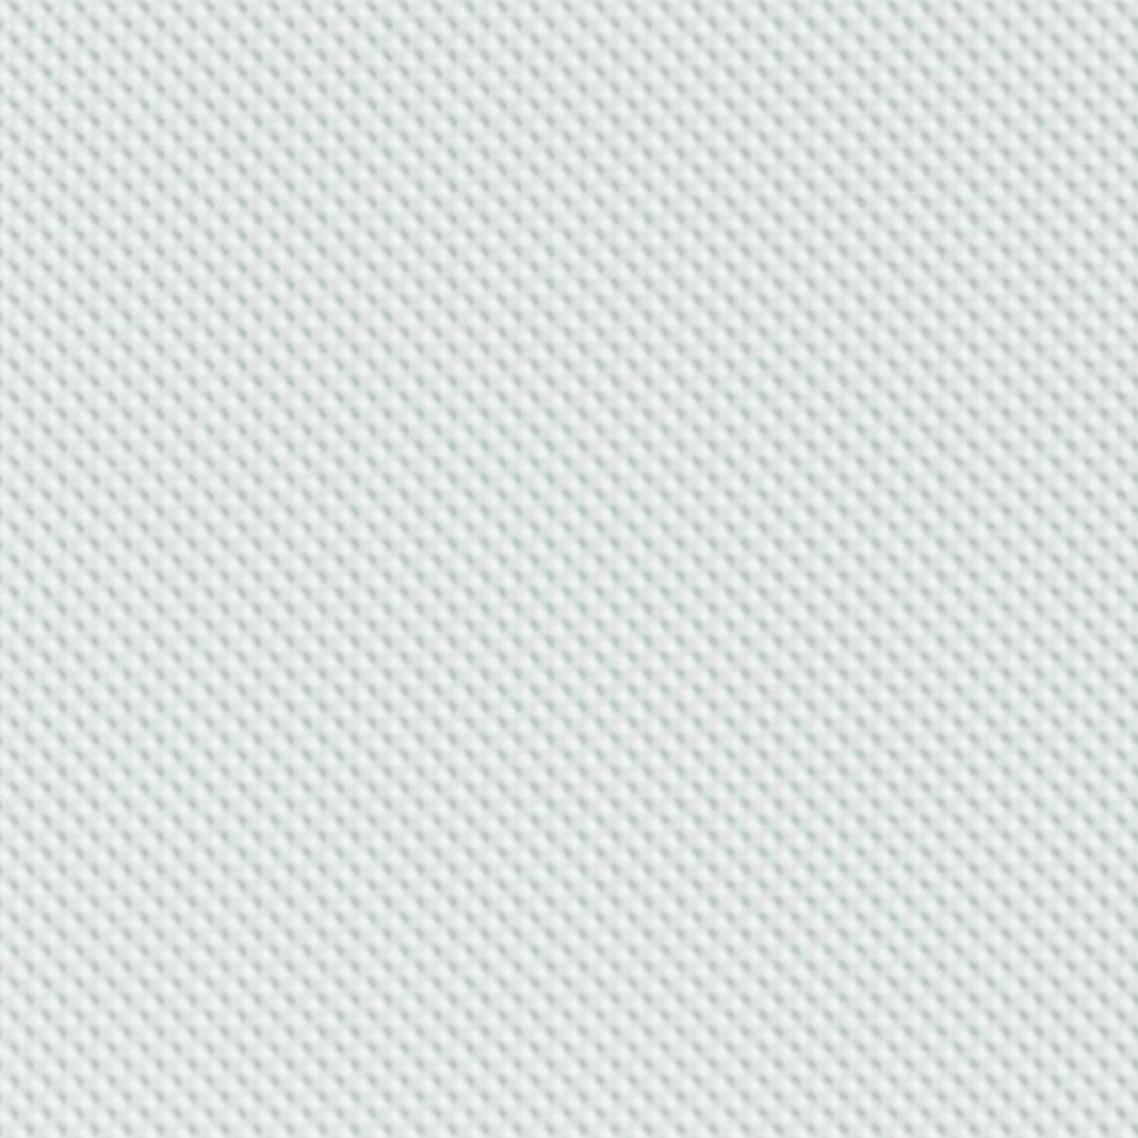 Showscape Stylish White Reverse Dot